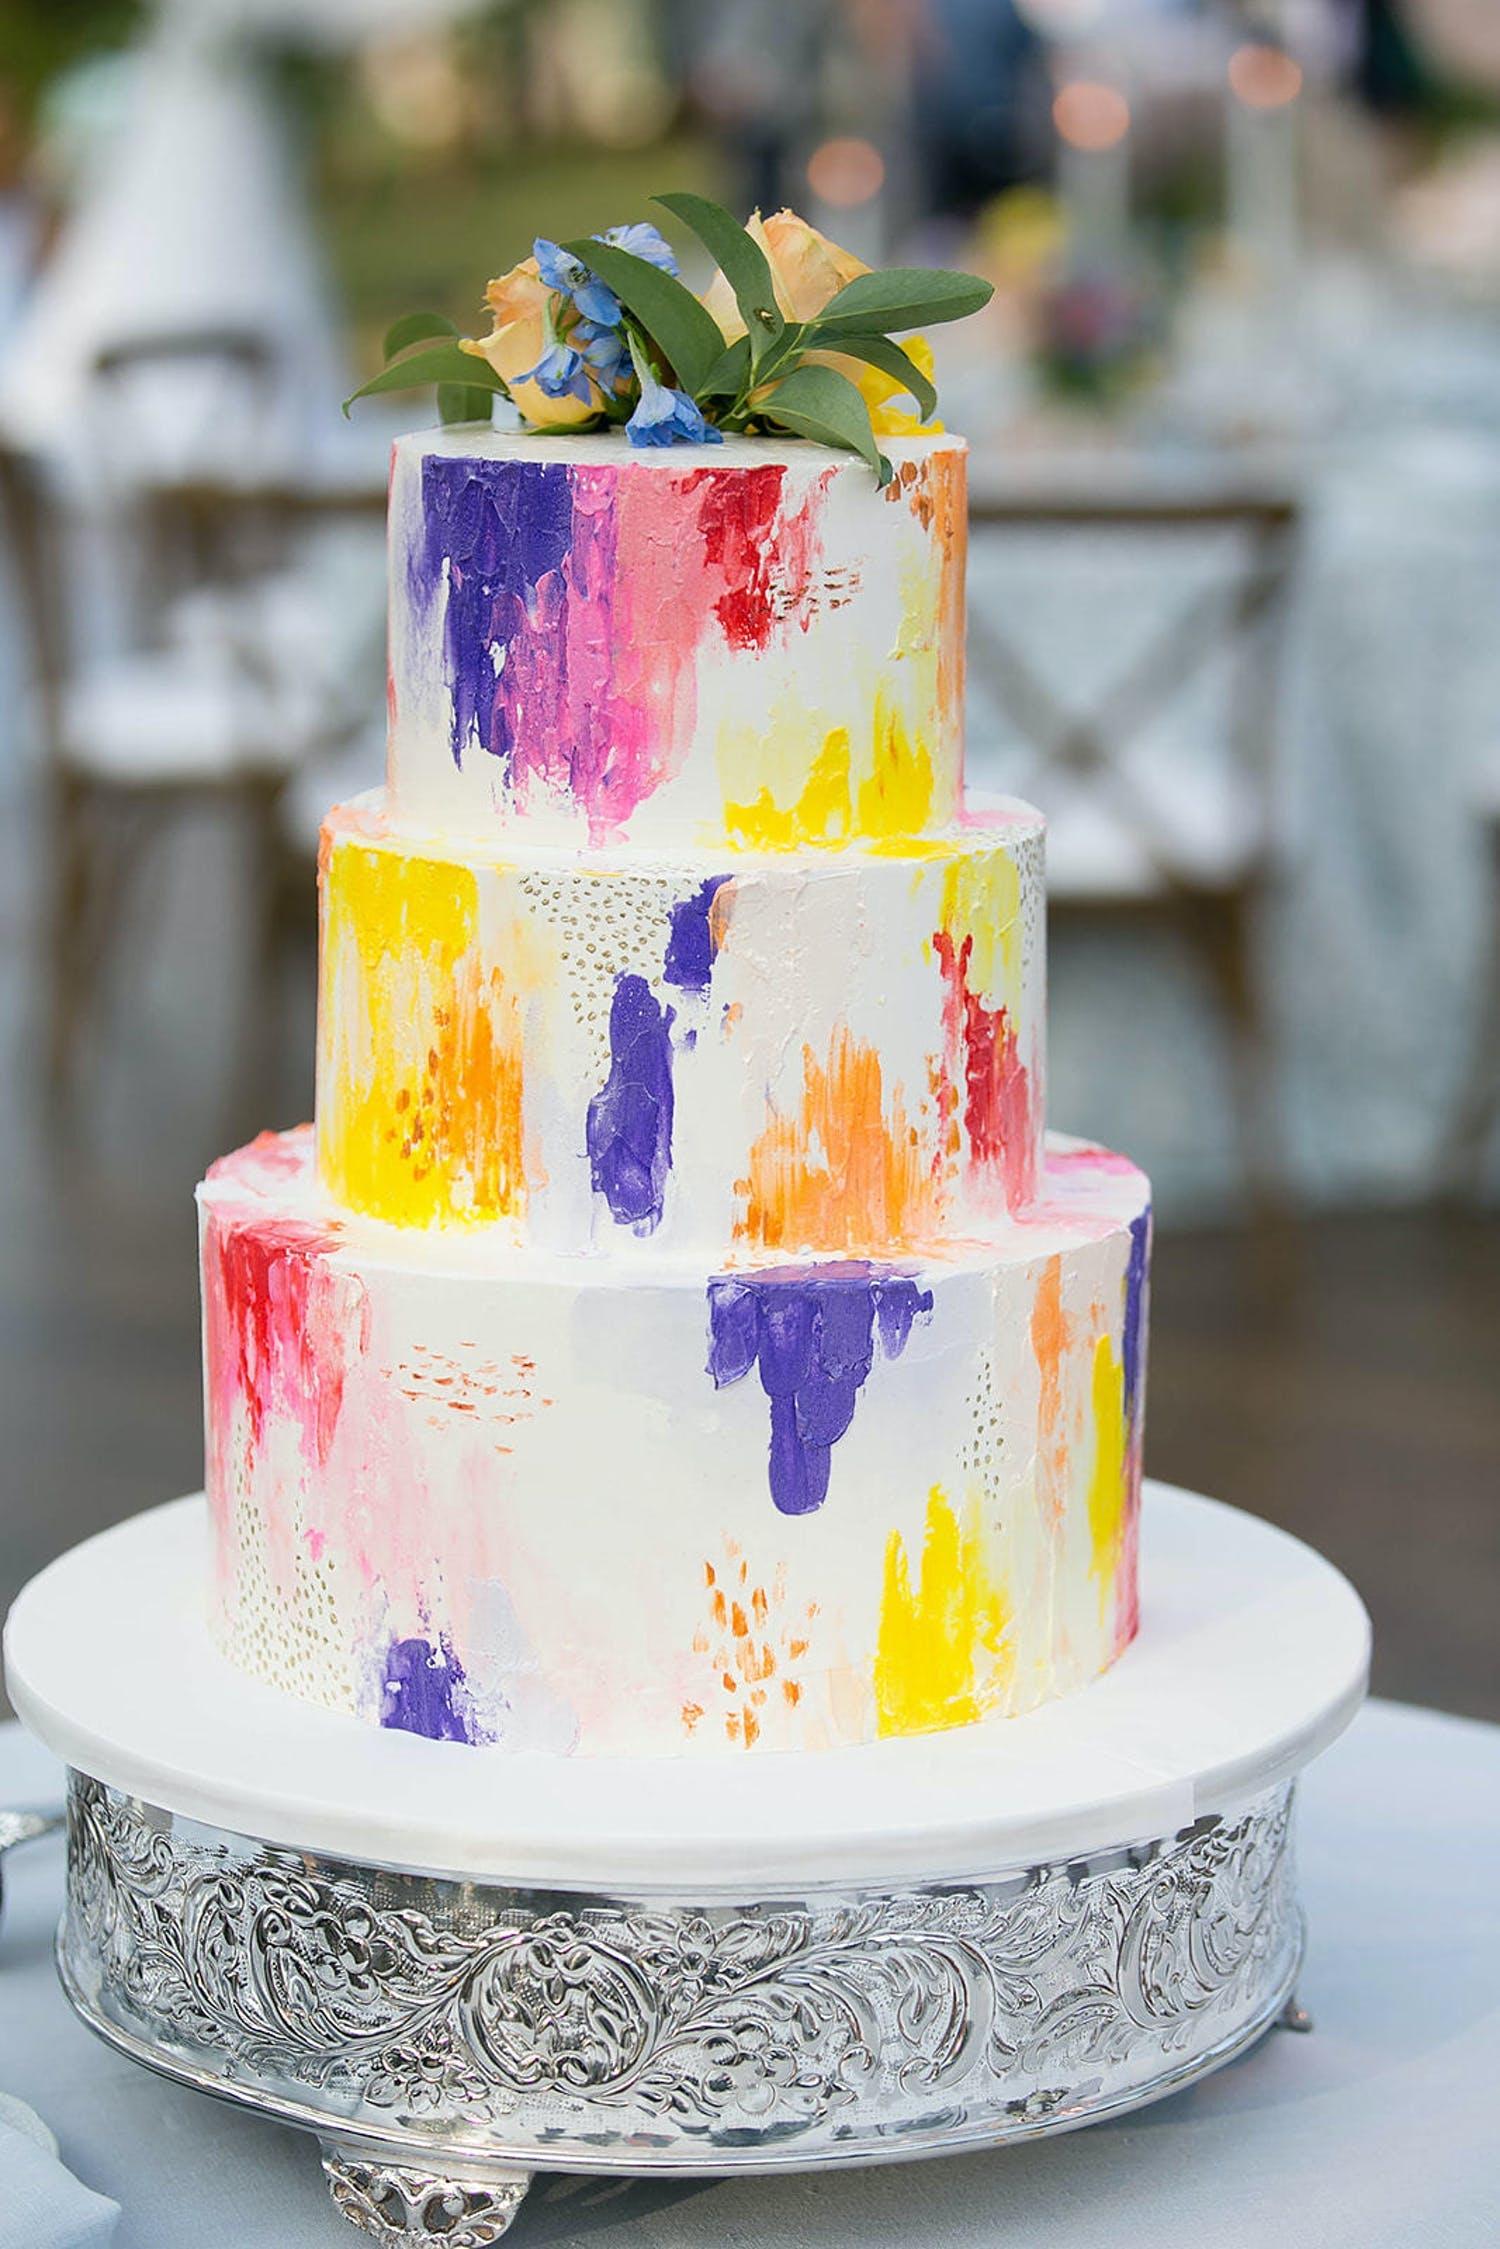 Three-tier white wedding cake with splatter of pink, purple, orange and yellow | PartySlate